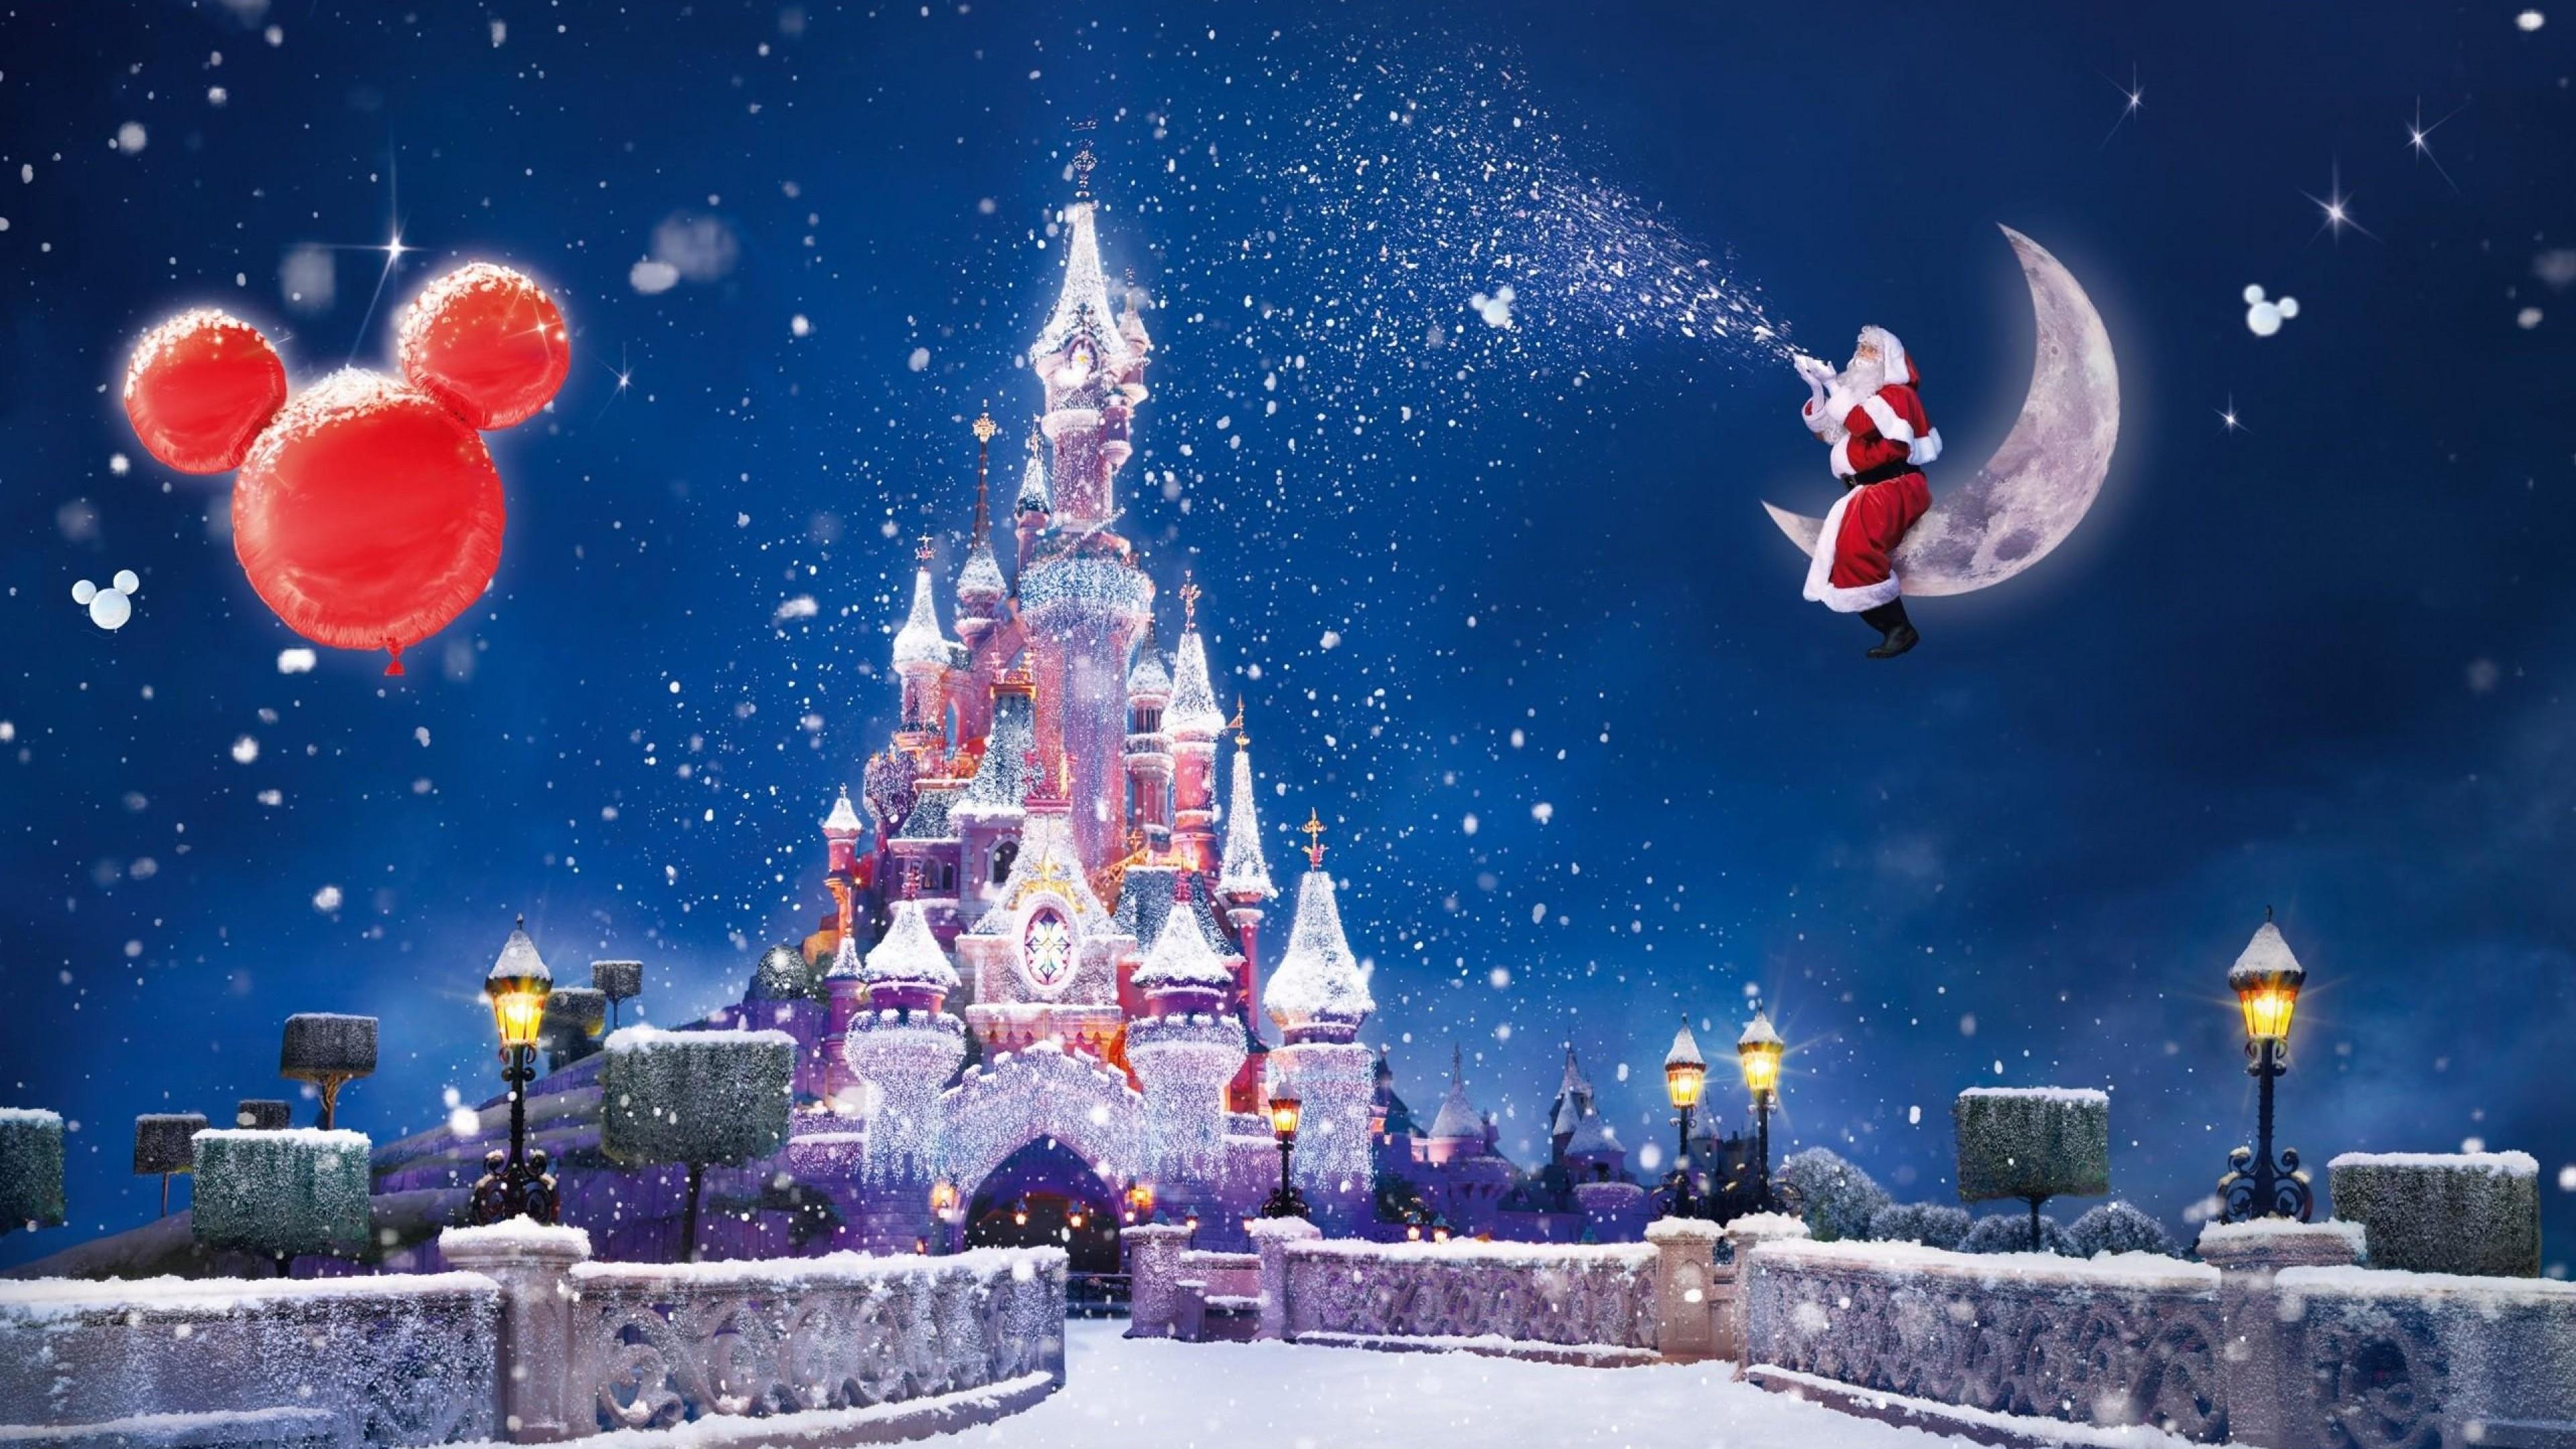 Wallpaper santa claus, magic, moon, snow, castle, balloons,  holiday